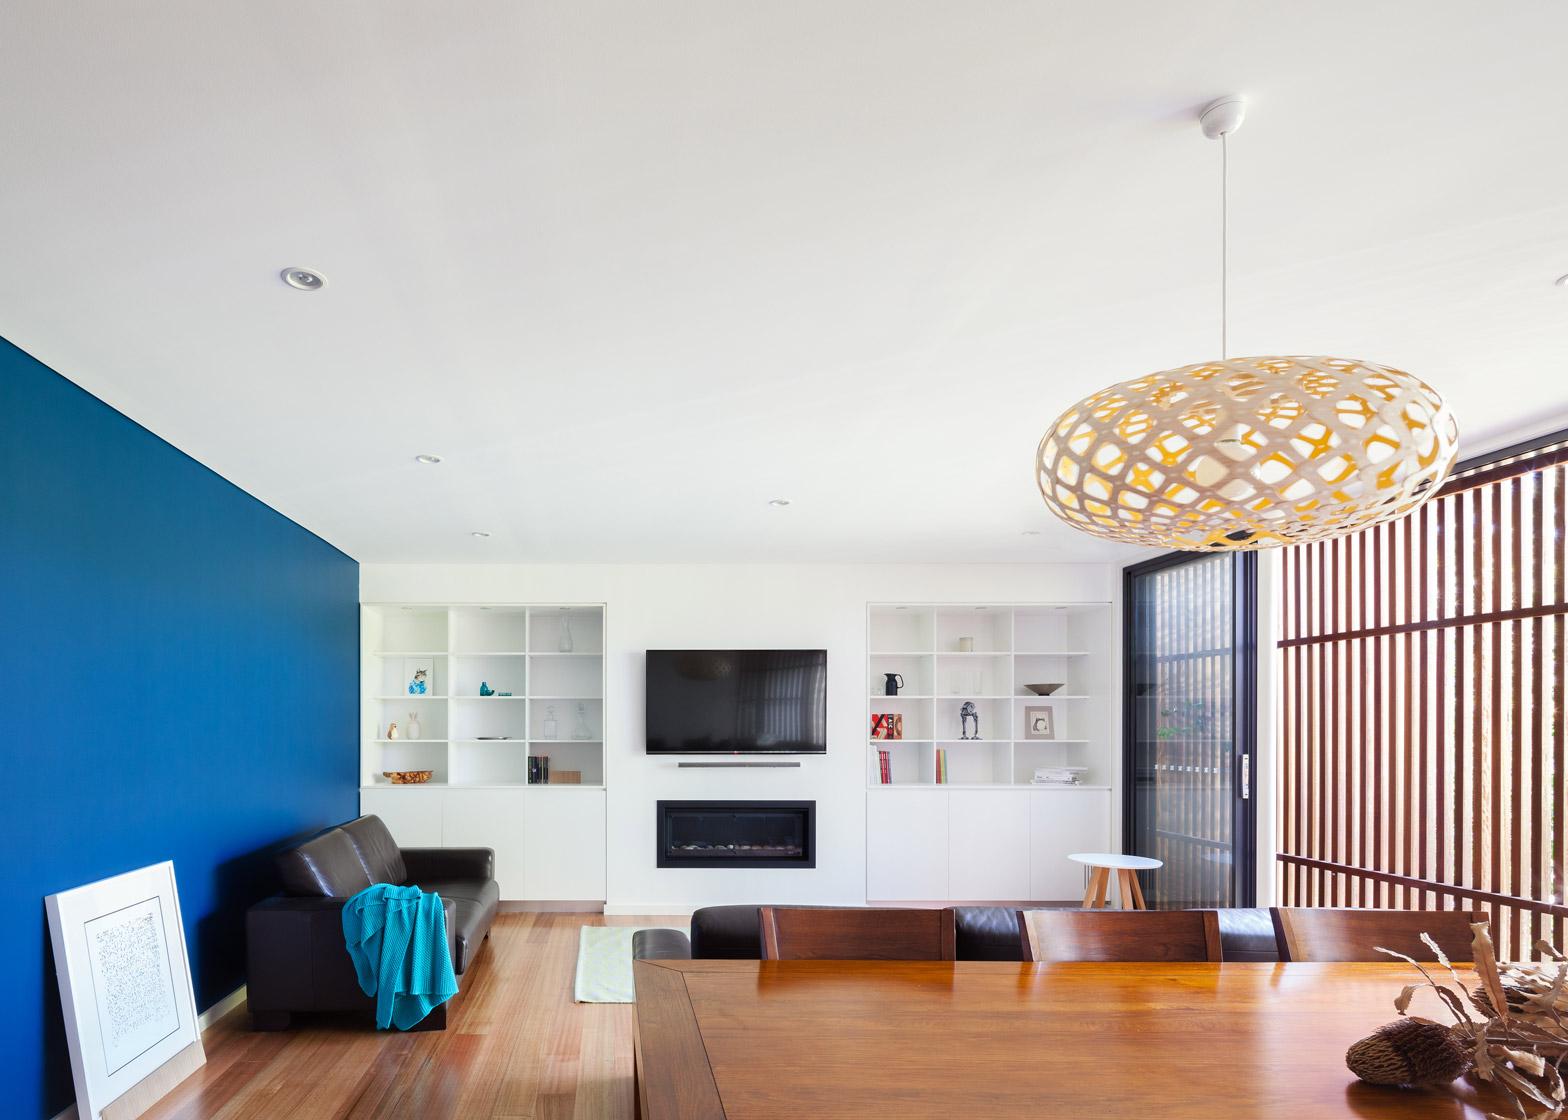 Escu House by Bijl Architecture